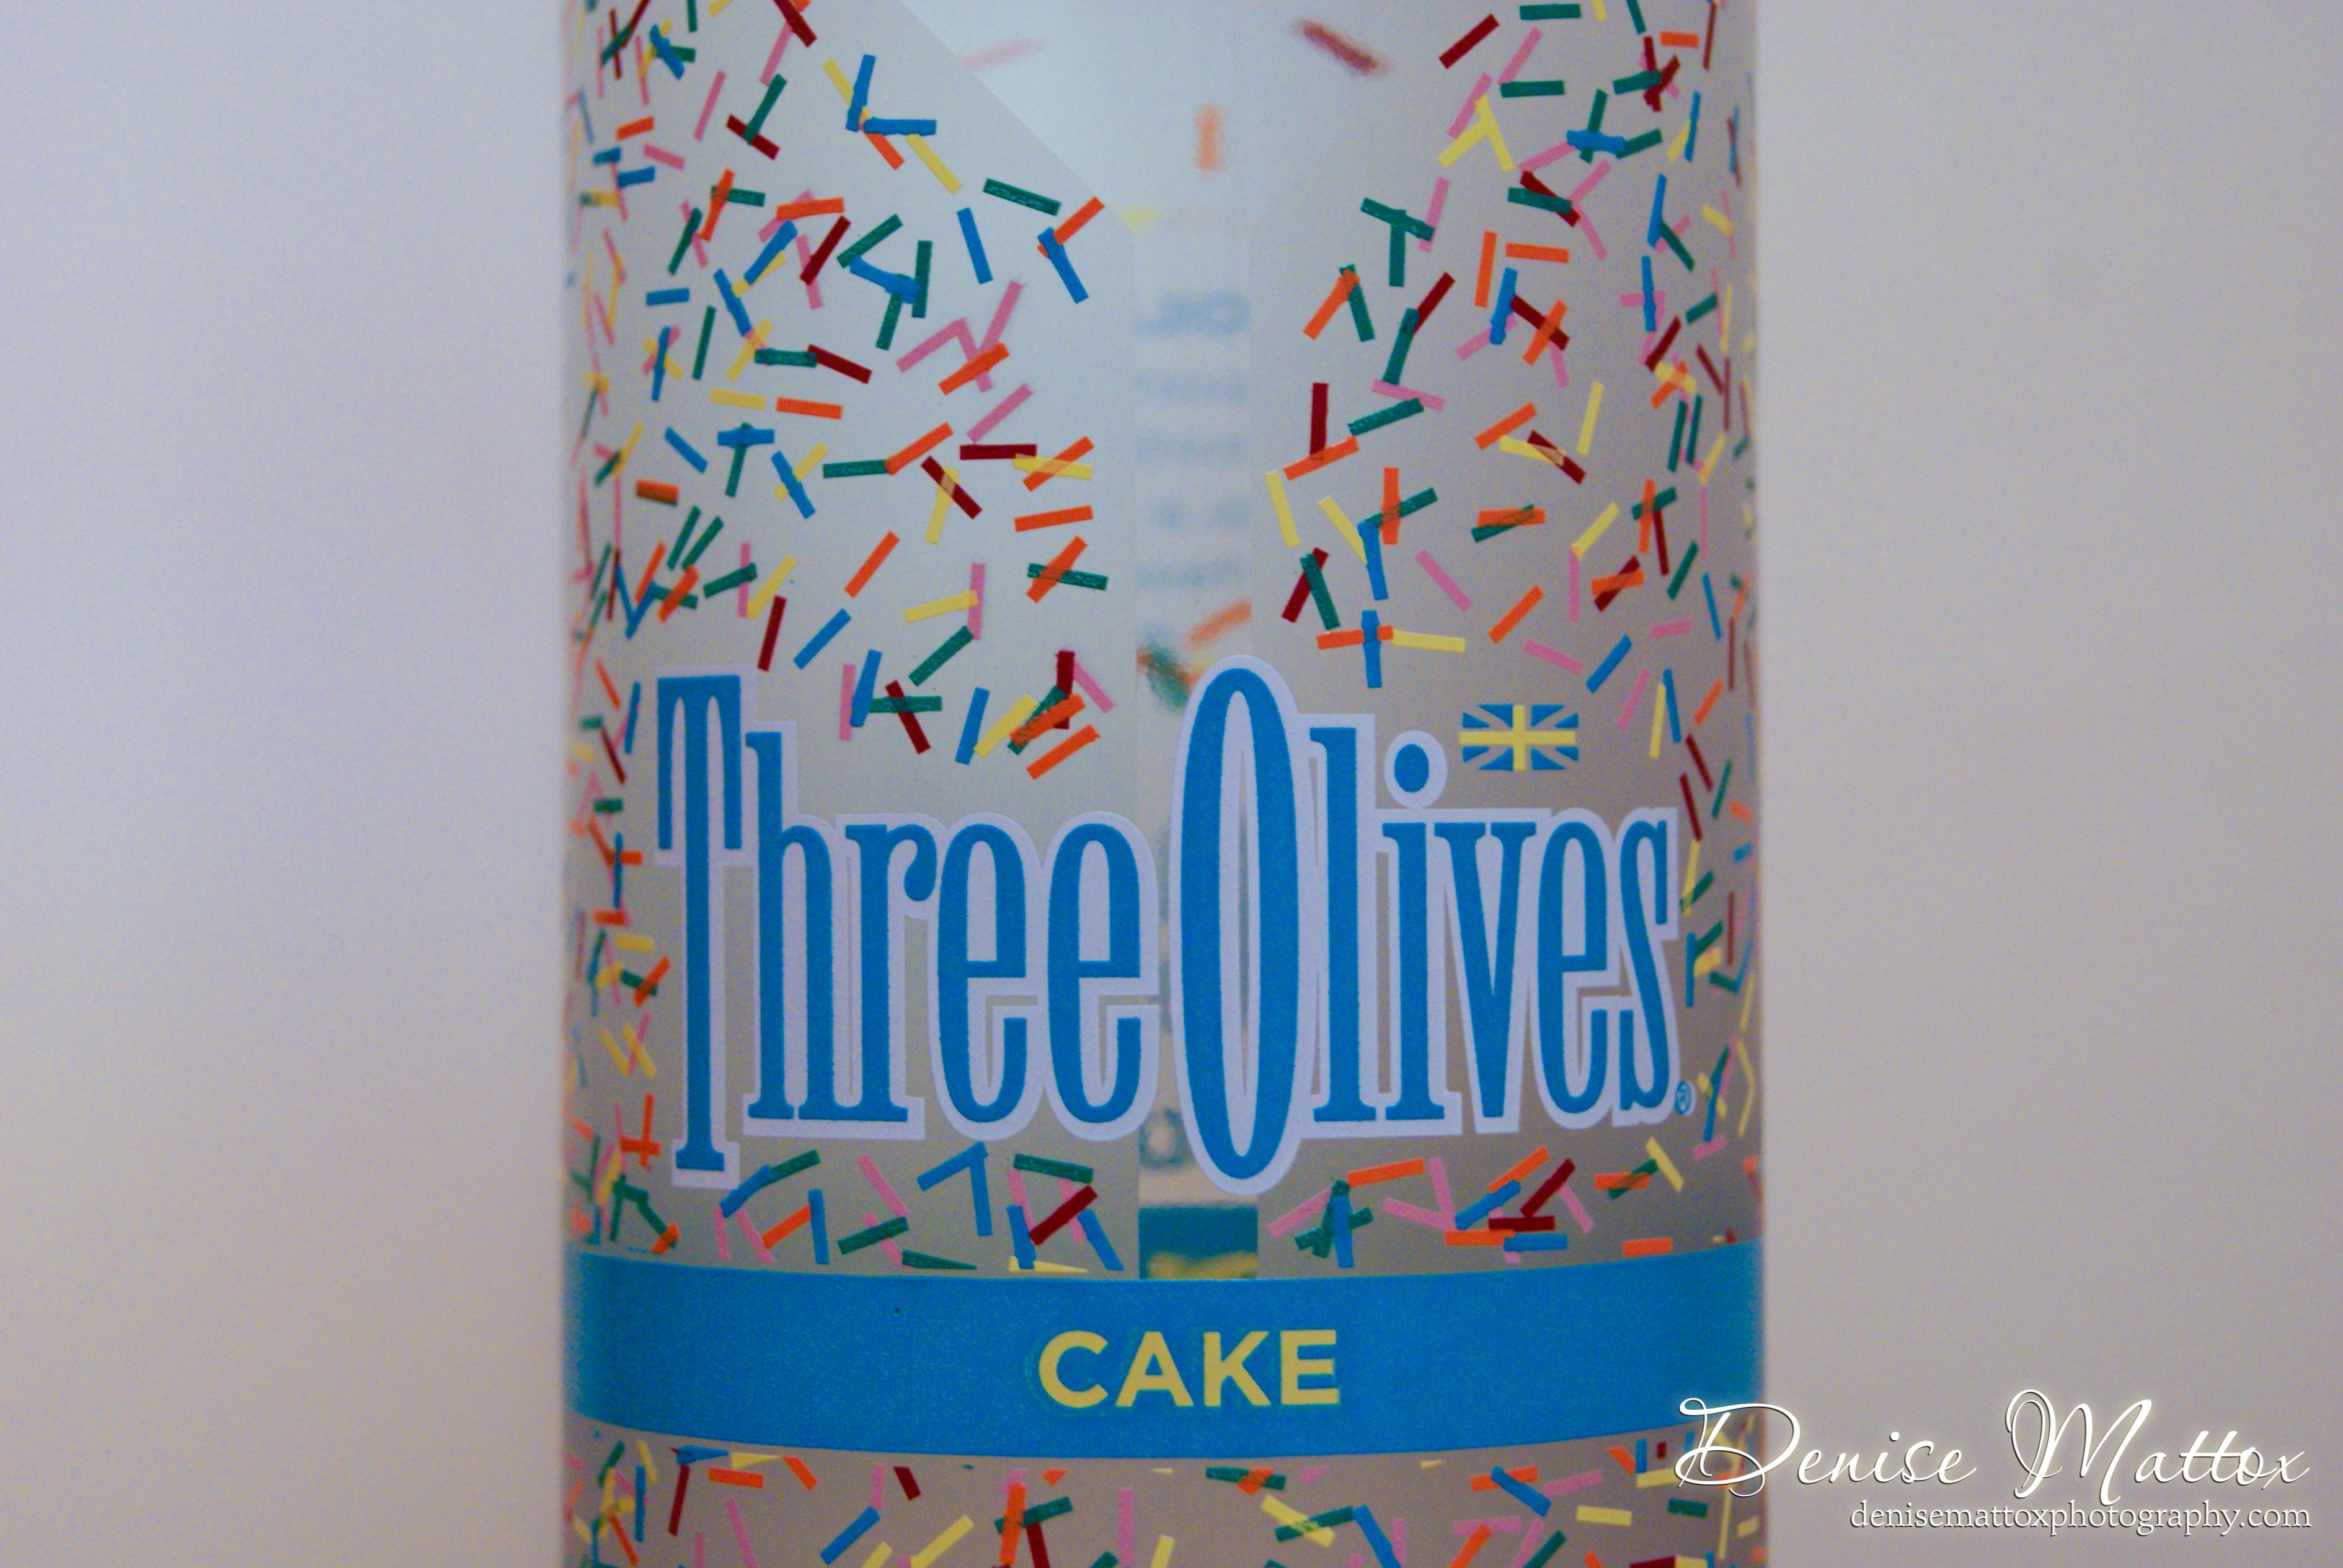 Cake Flavored Vodka Recipes Three Olives